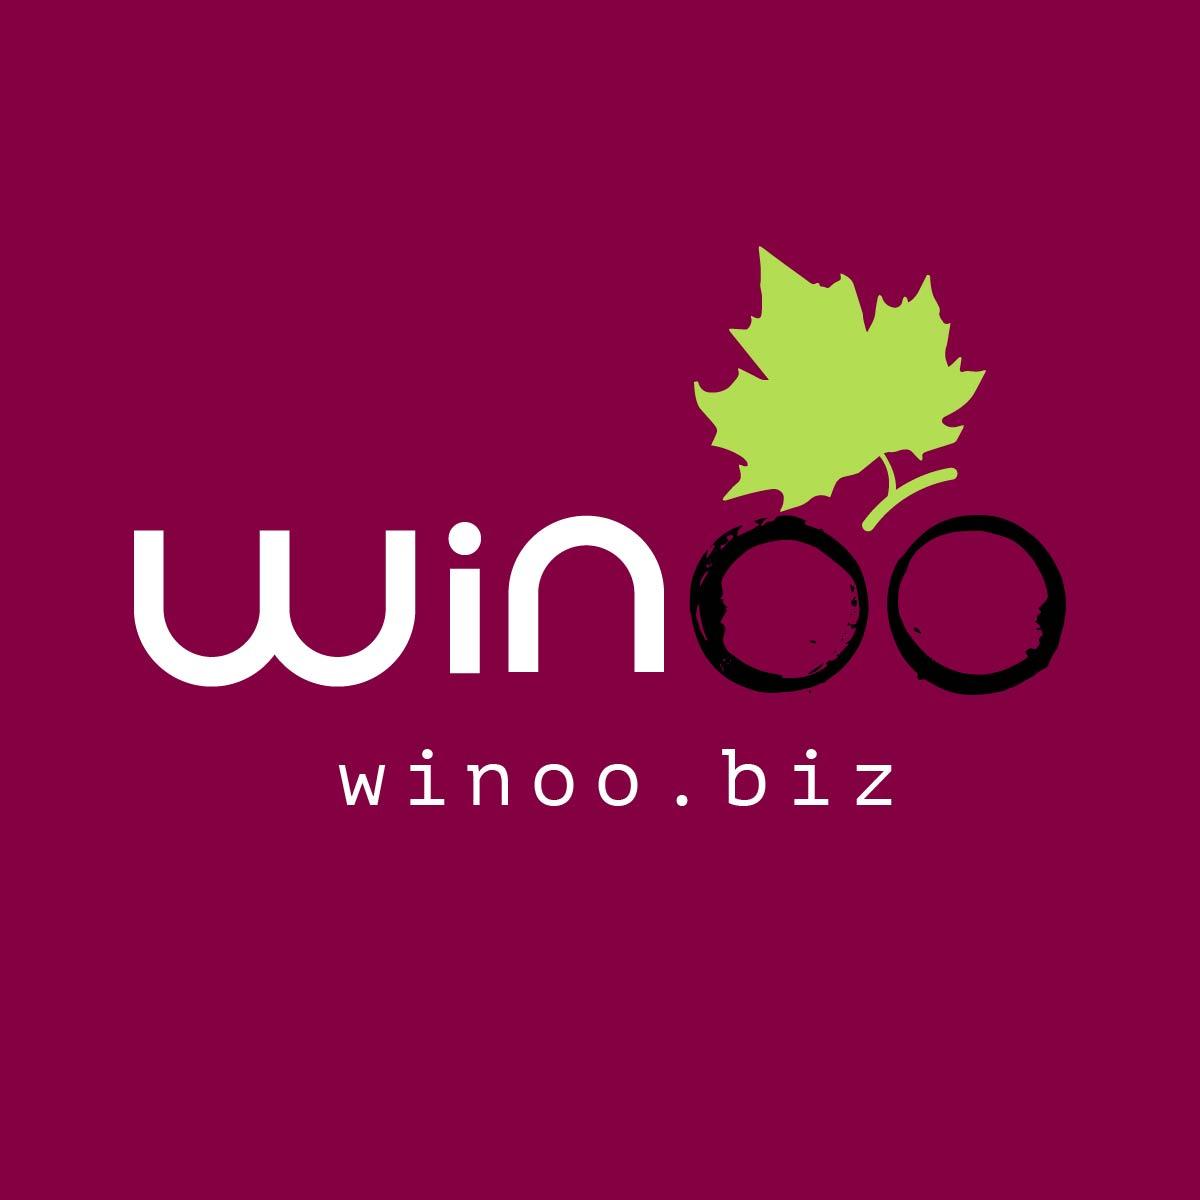 winoo - Brand design by Brandizle